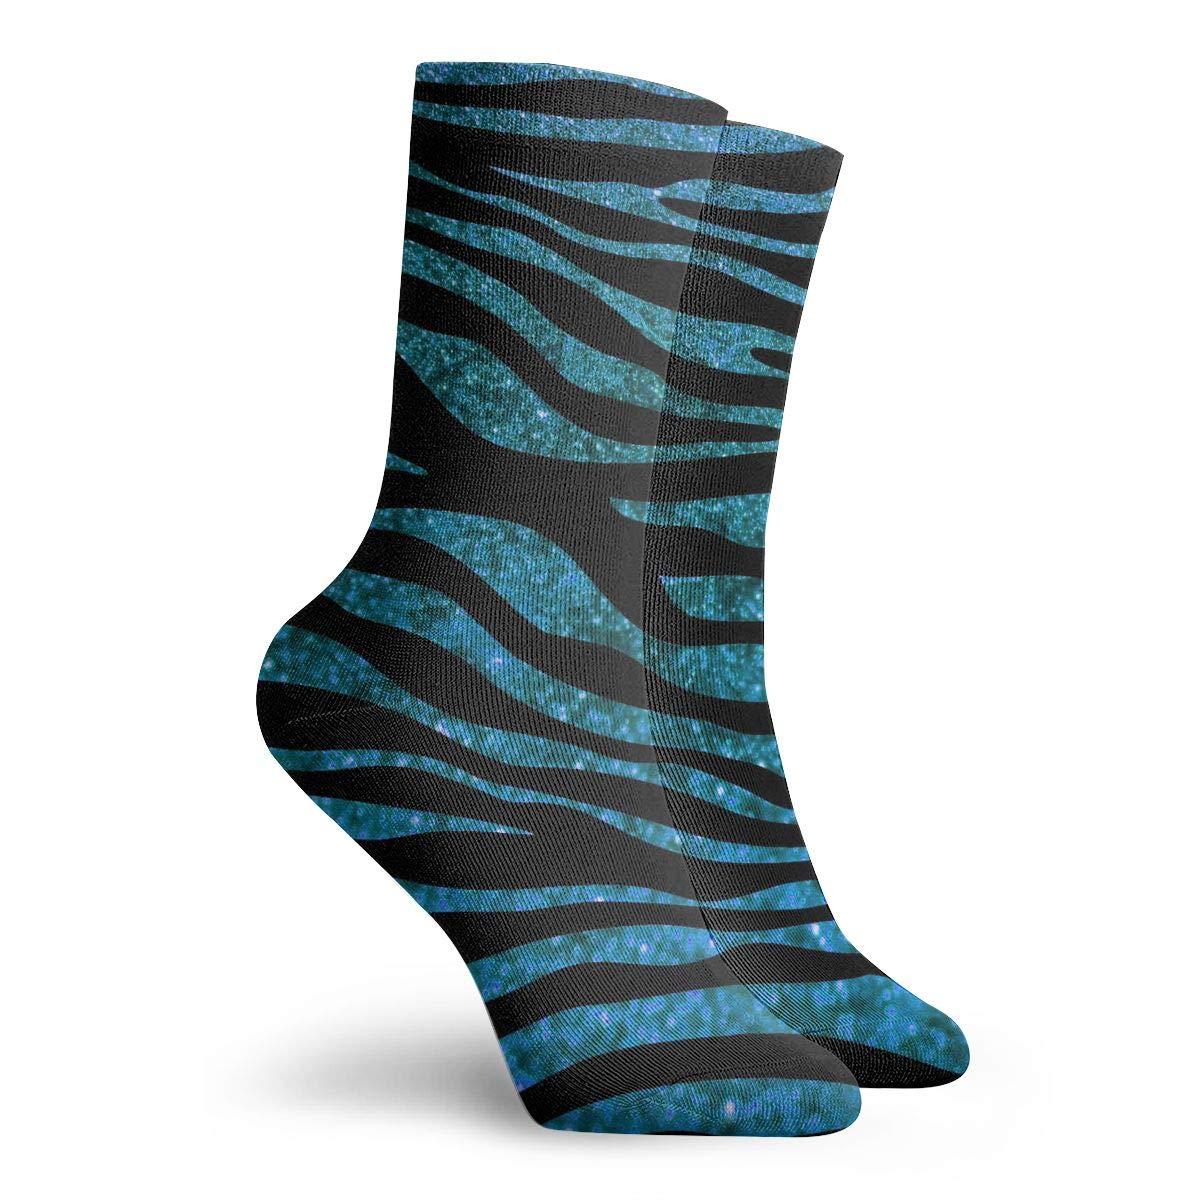 Blue Leopard Print Unisex Funny Casual Crew Socks Athletic Socks For Boys Girls Kids Teenagers